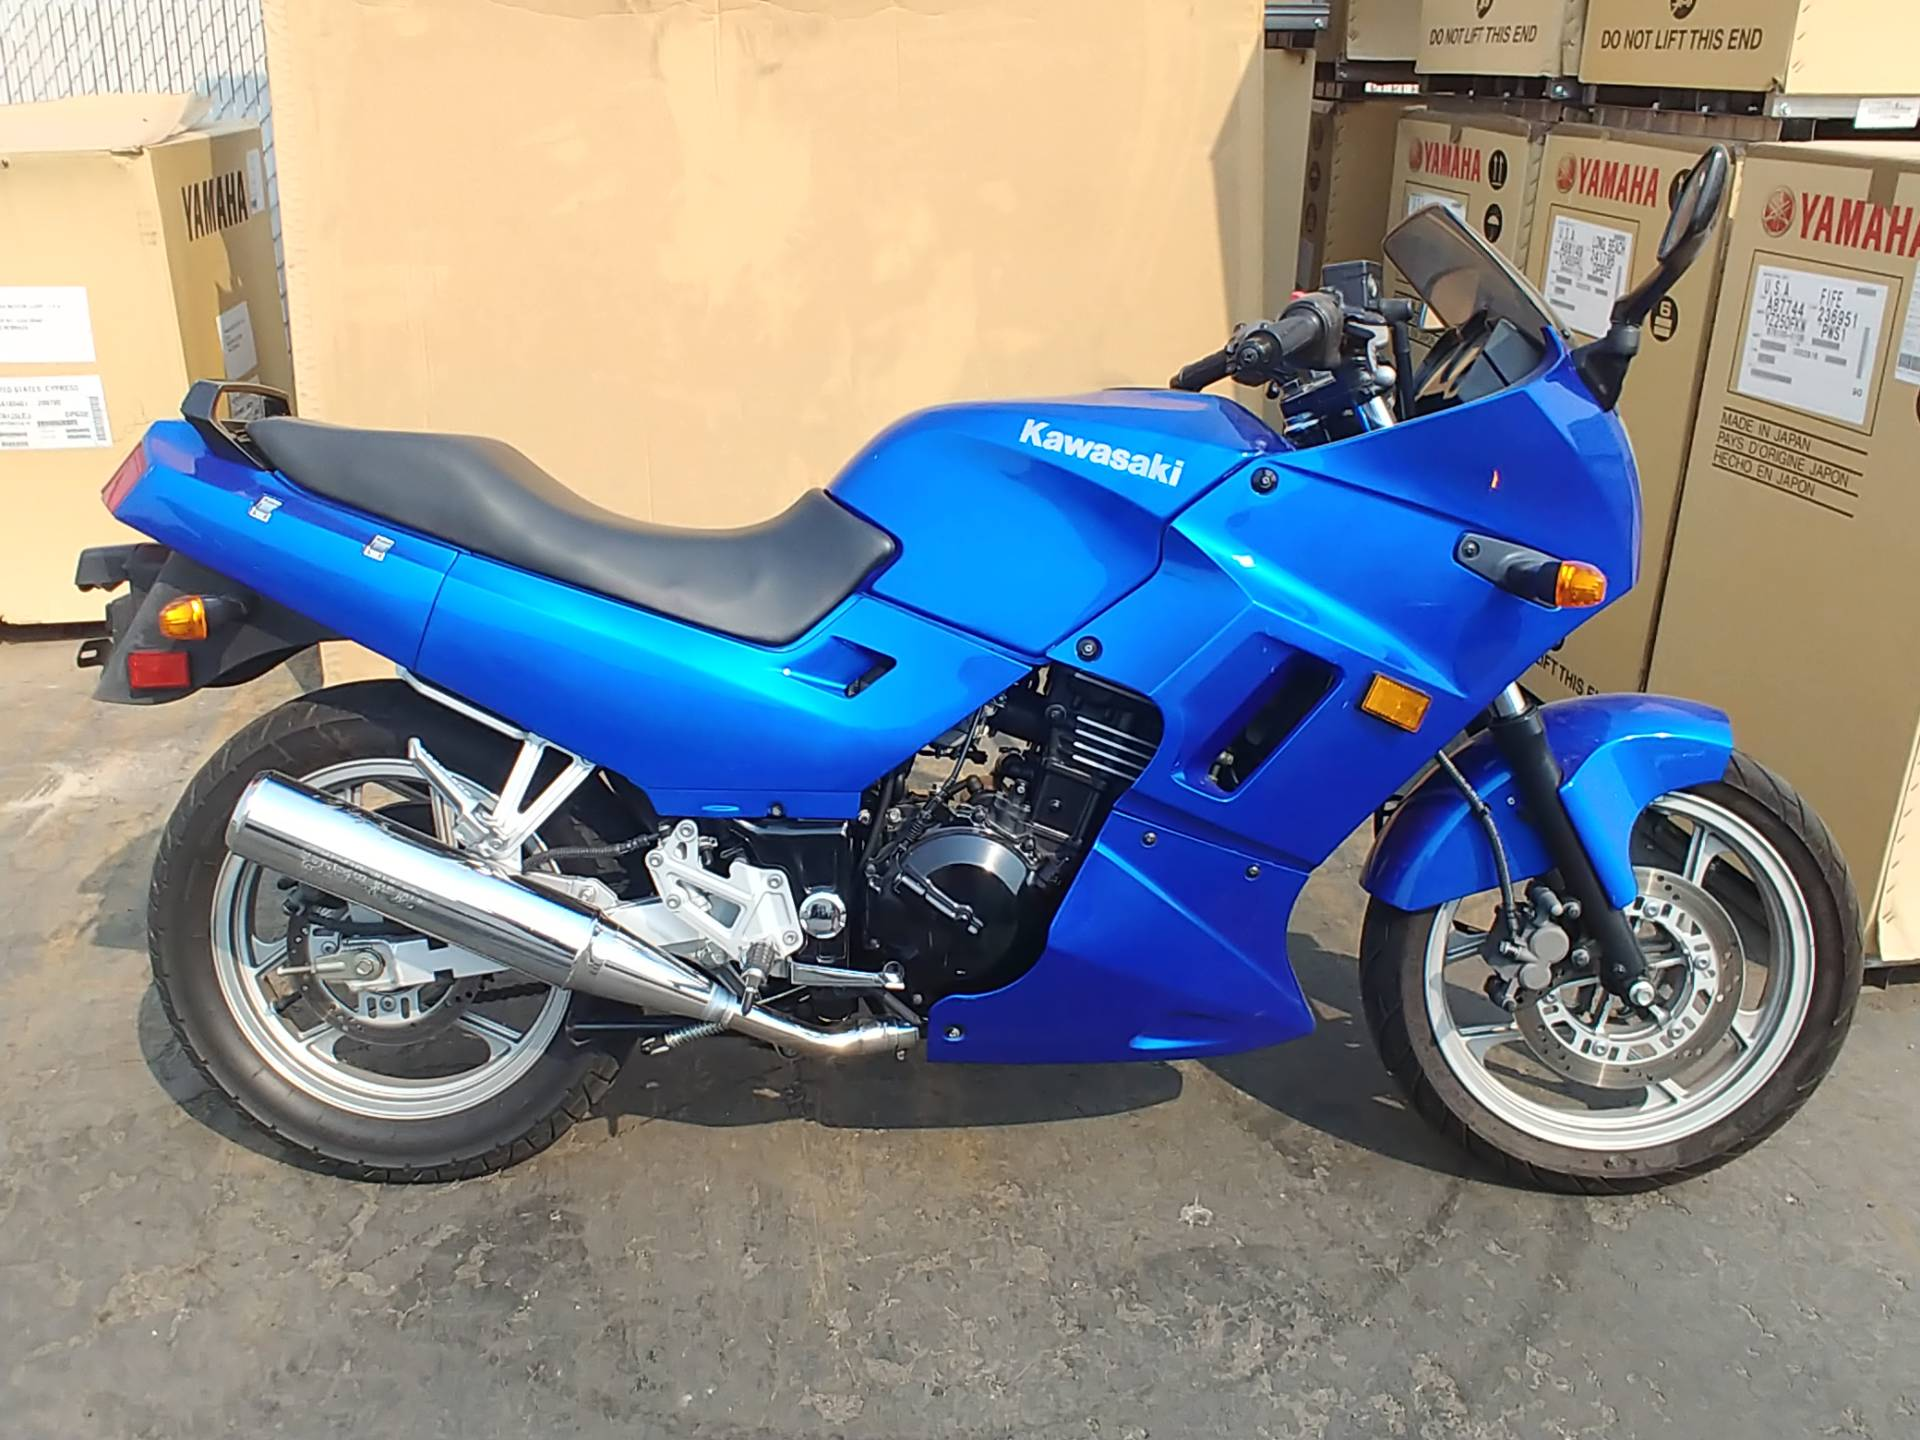 2007 Kawasaki Ninja 250R for sale 13877